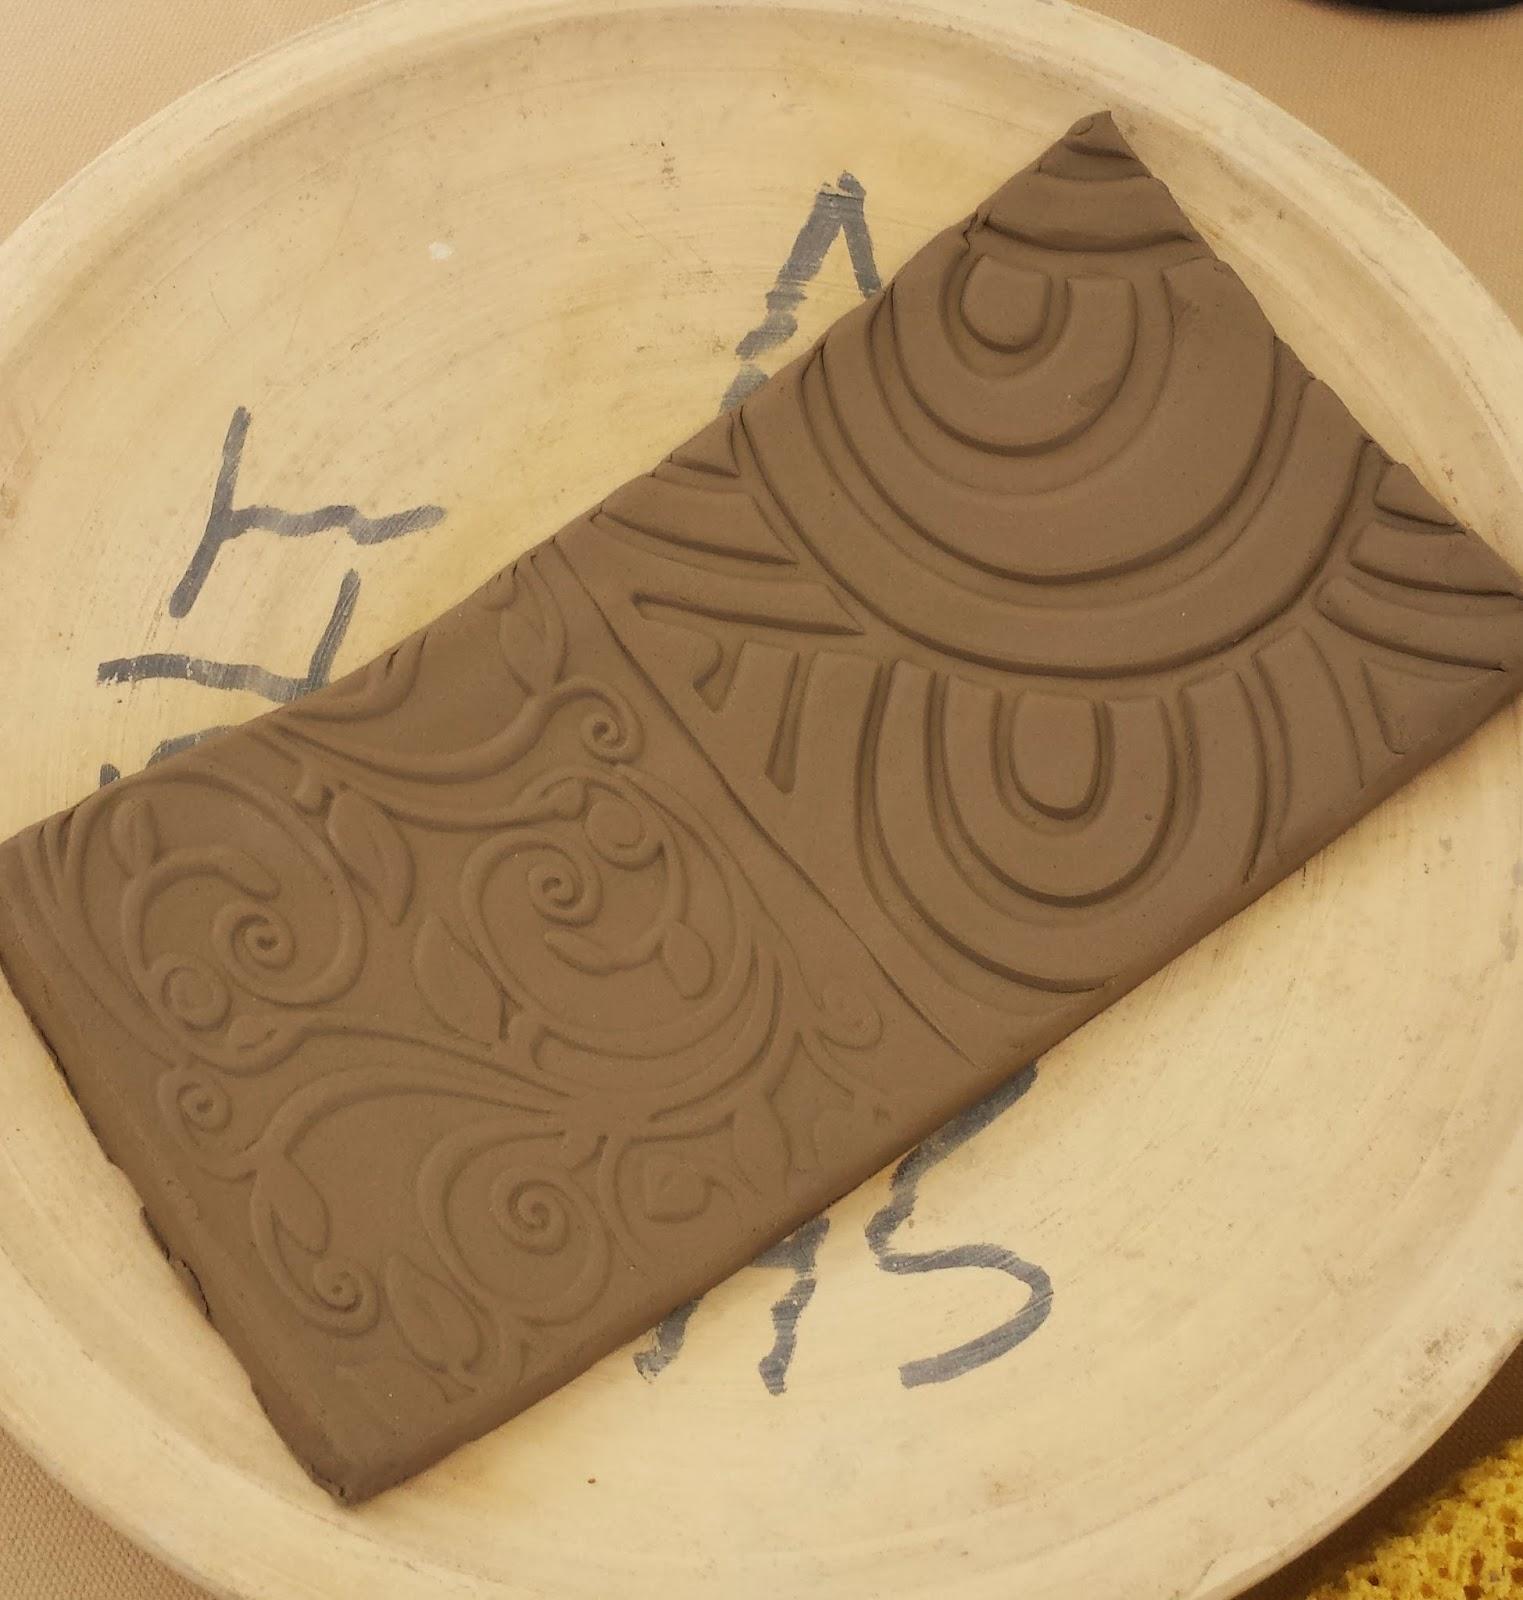 Handmade stoneware clay sushi plate in progress.